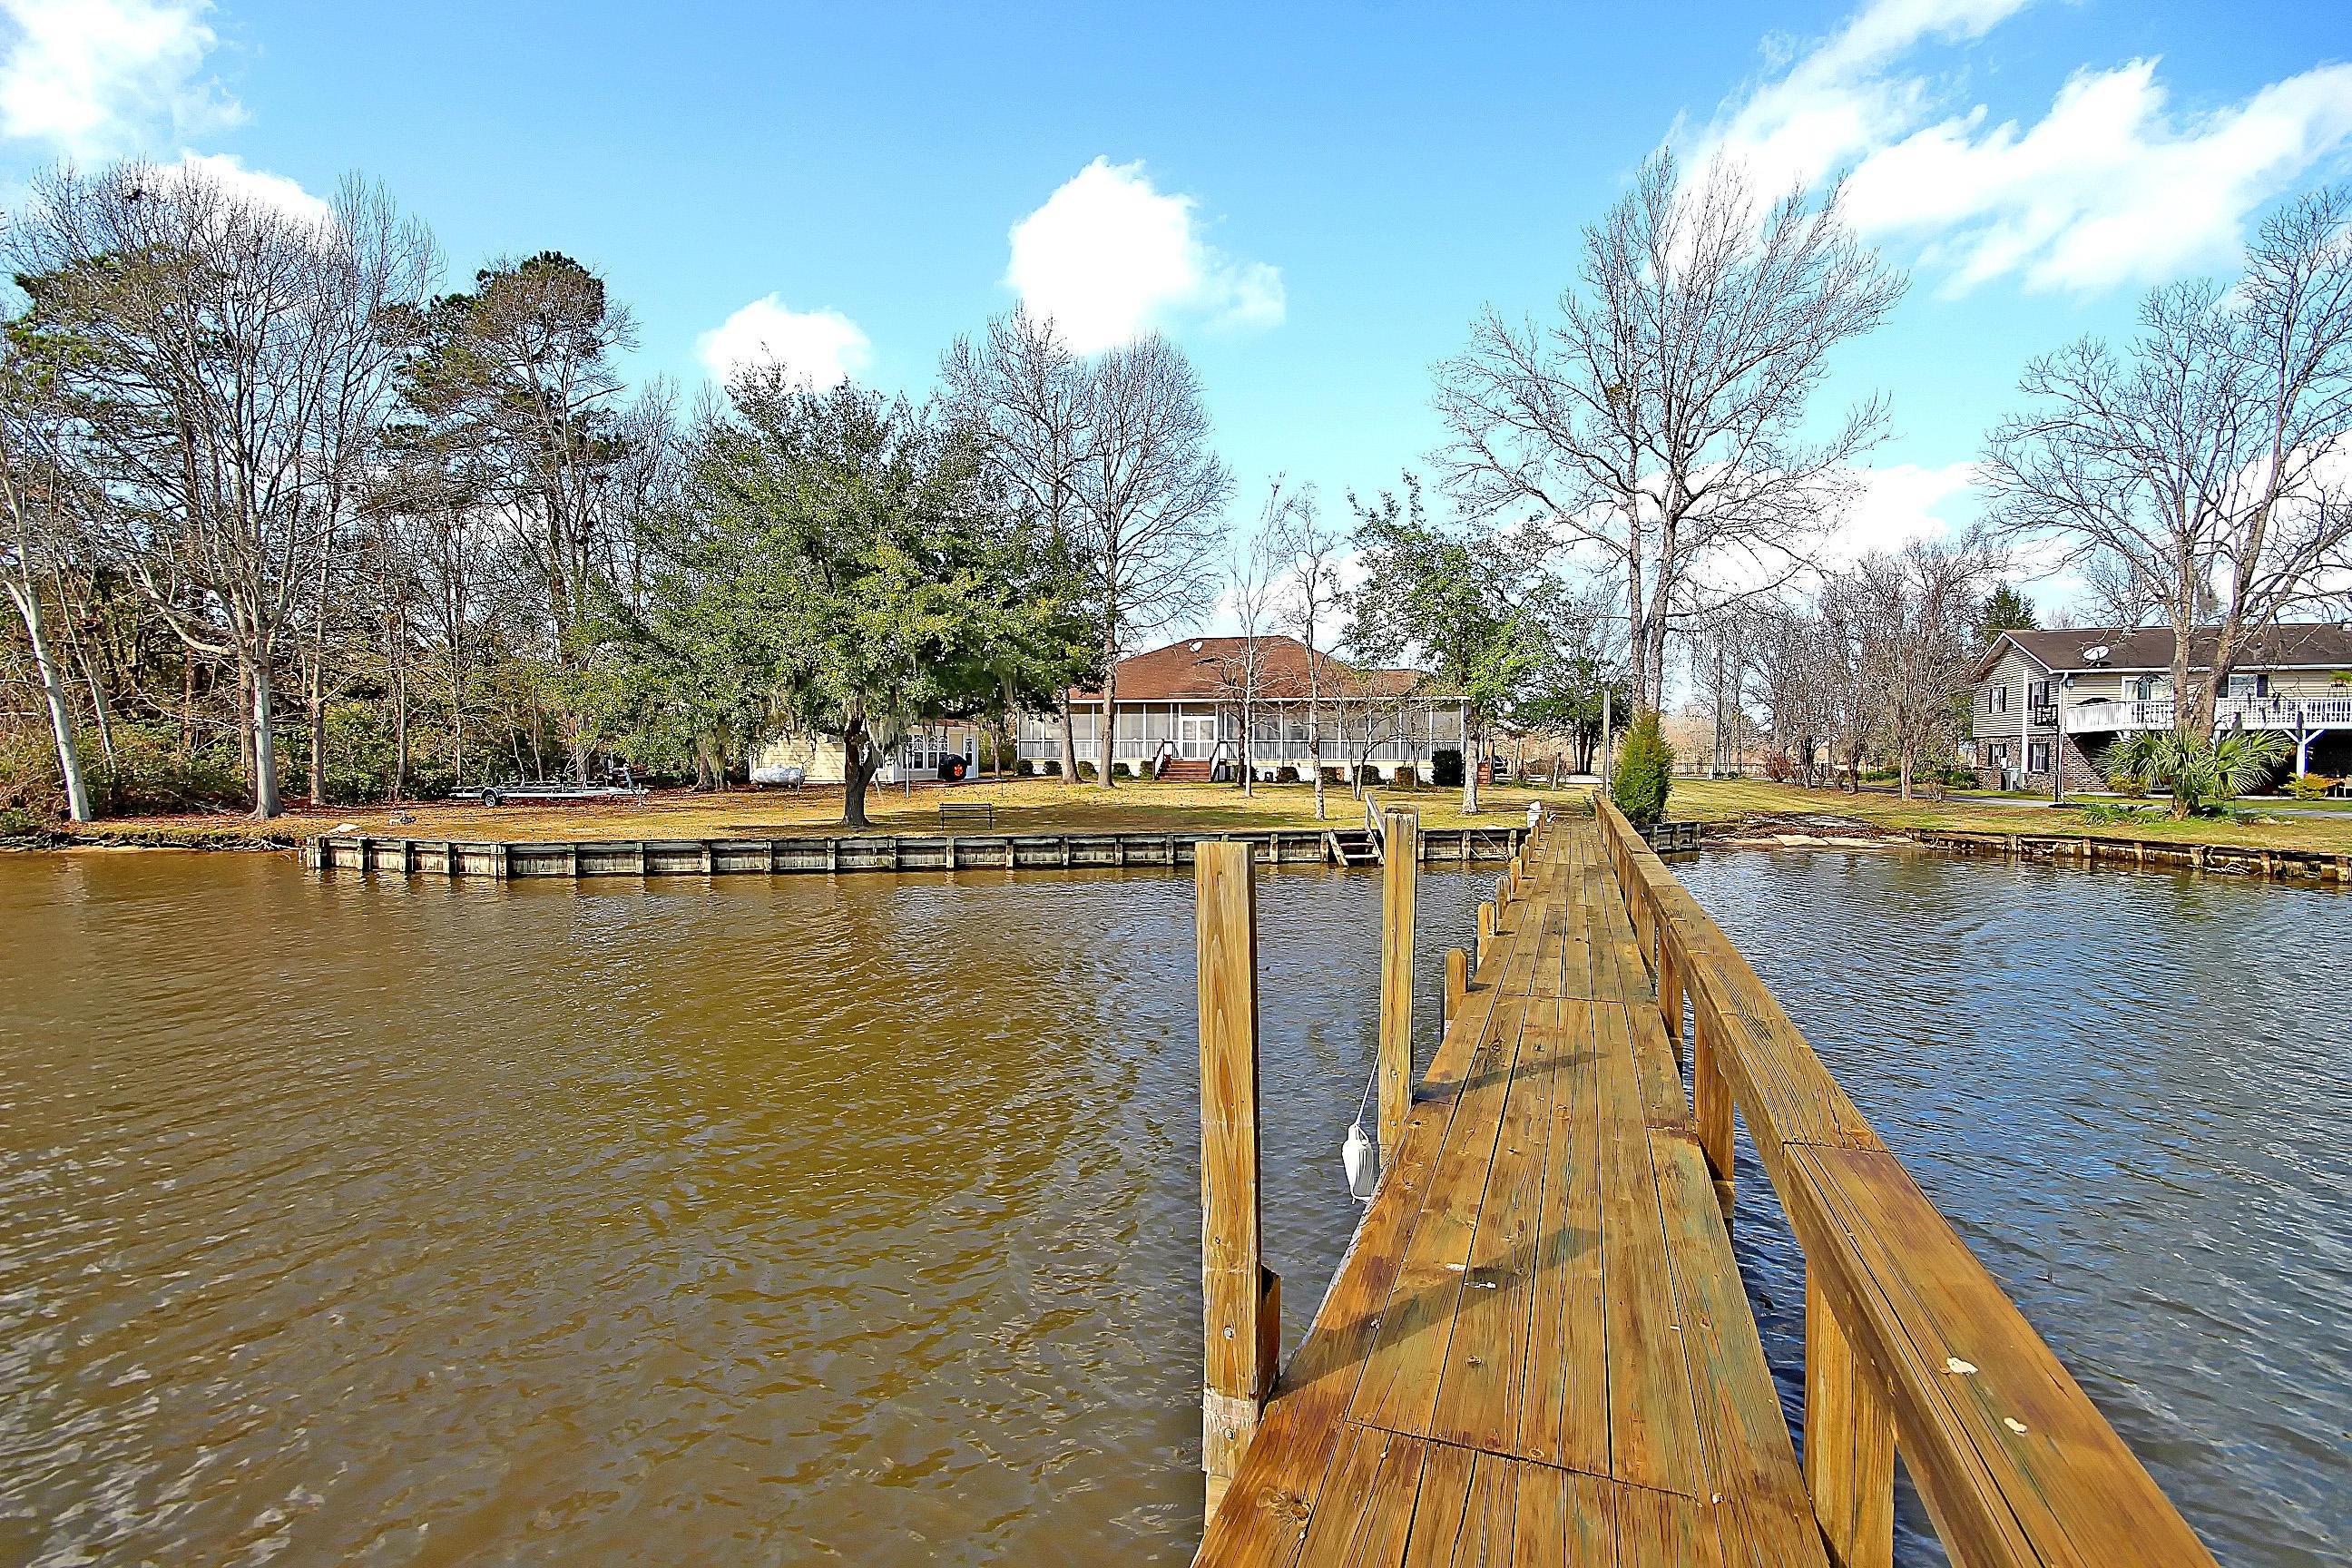 Cross Subd (Longpoint) Homes For Sale - 1191 Longpoint, Cross, SC - 5